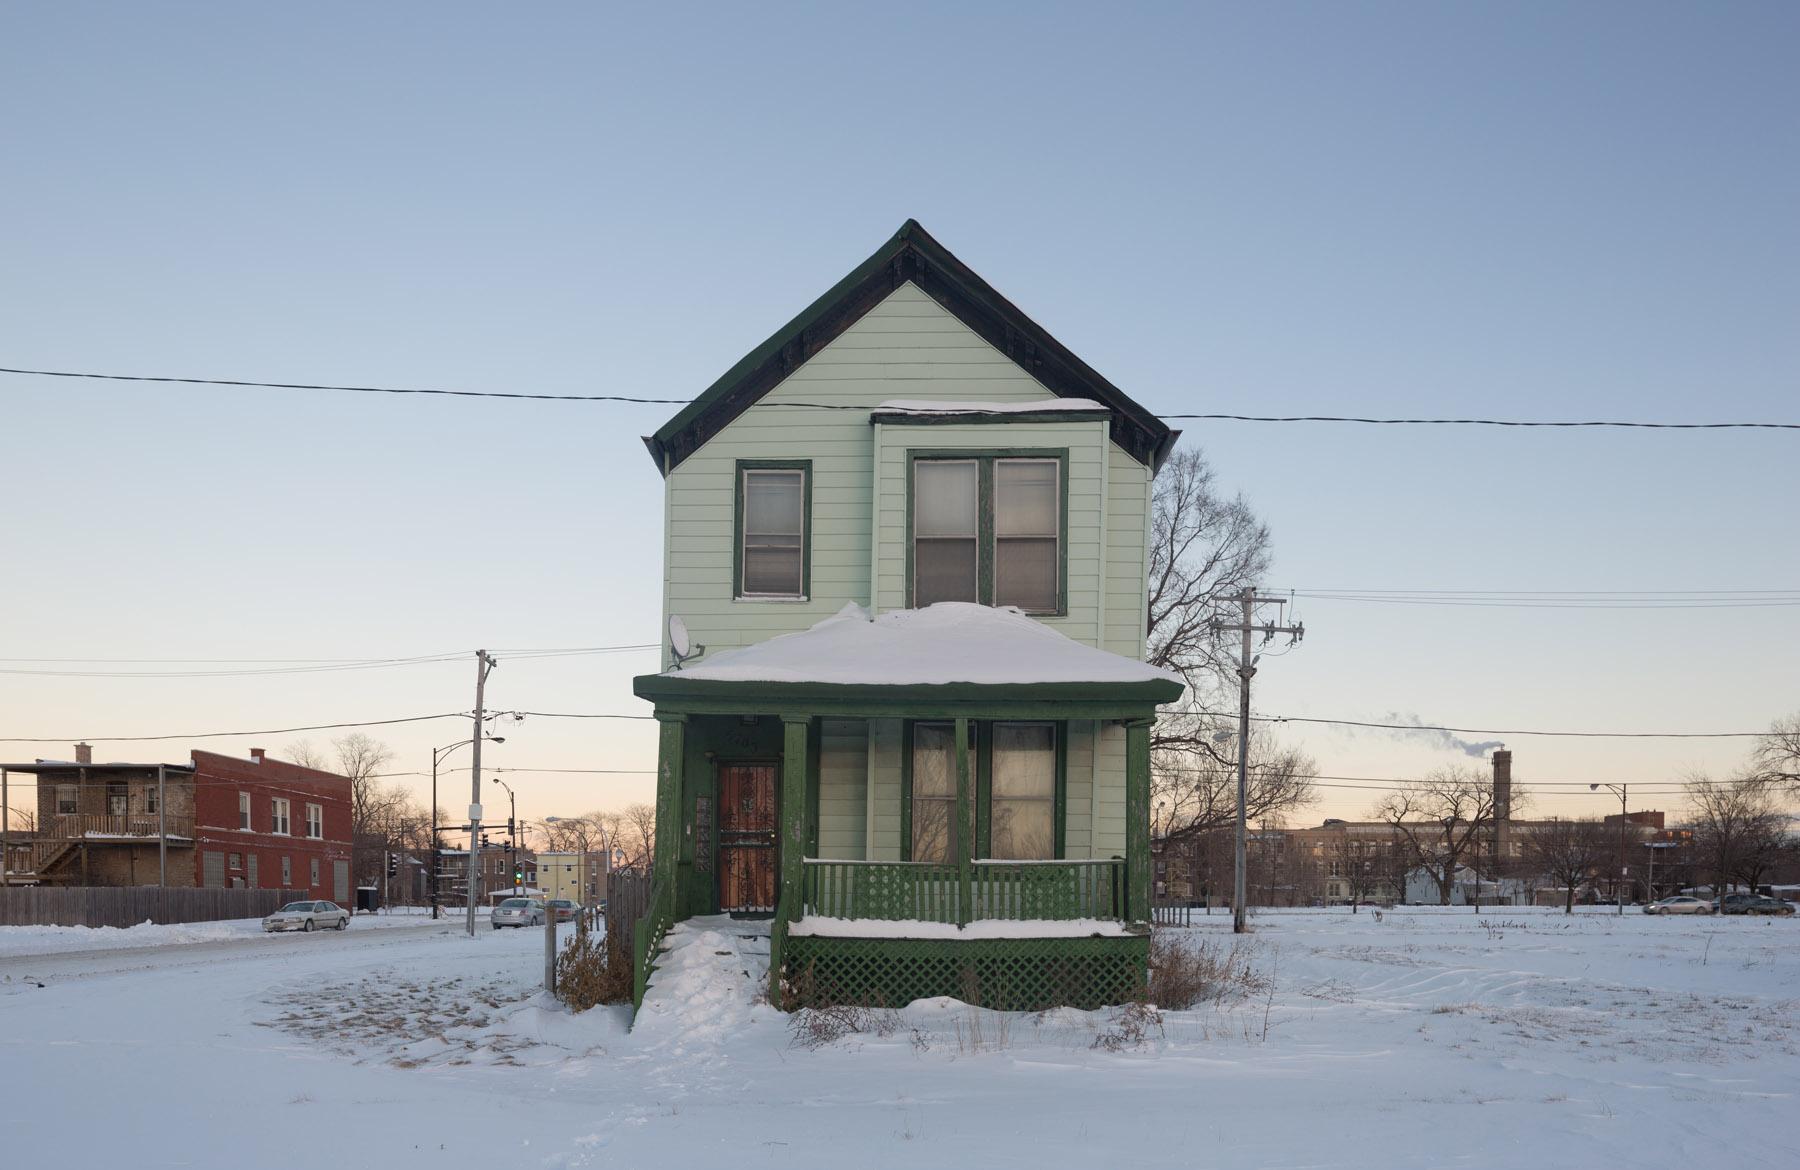 david schalliol isolated building studies